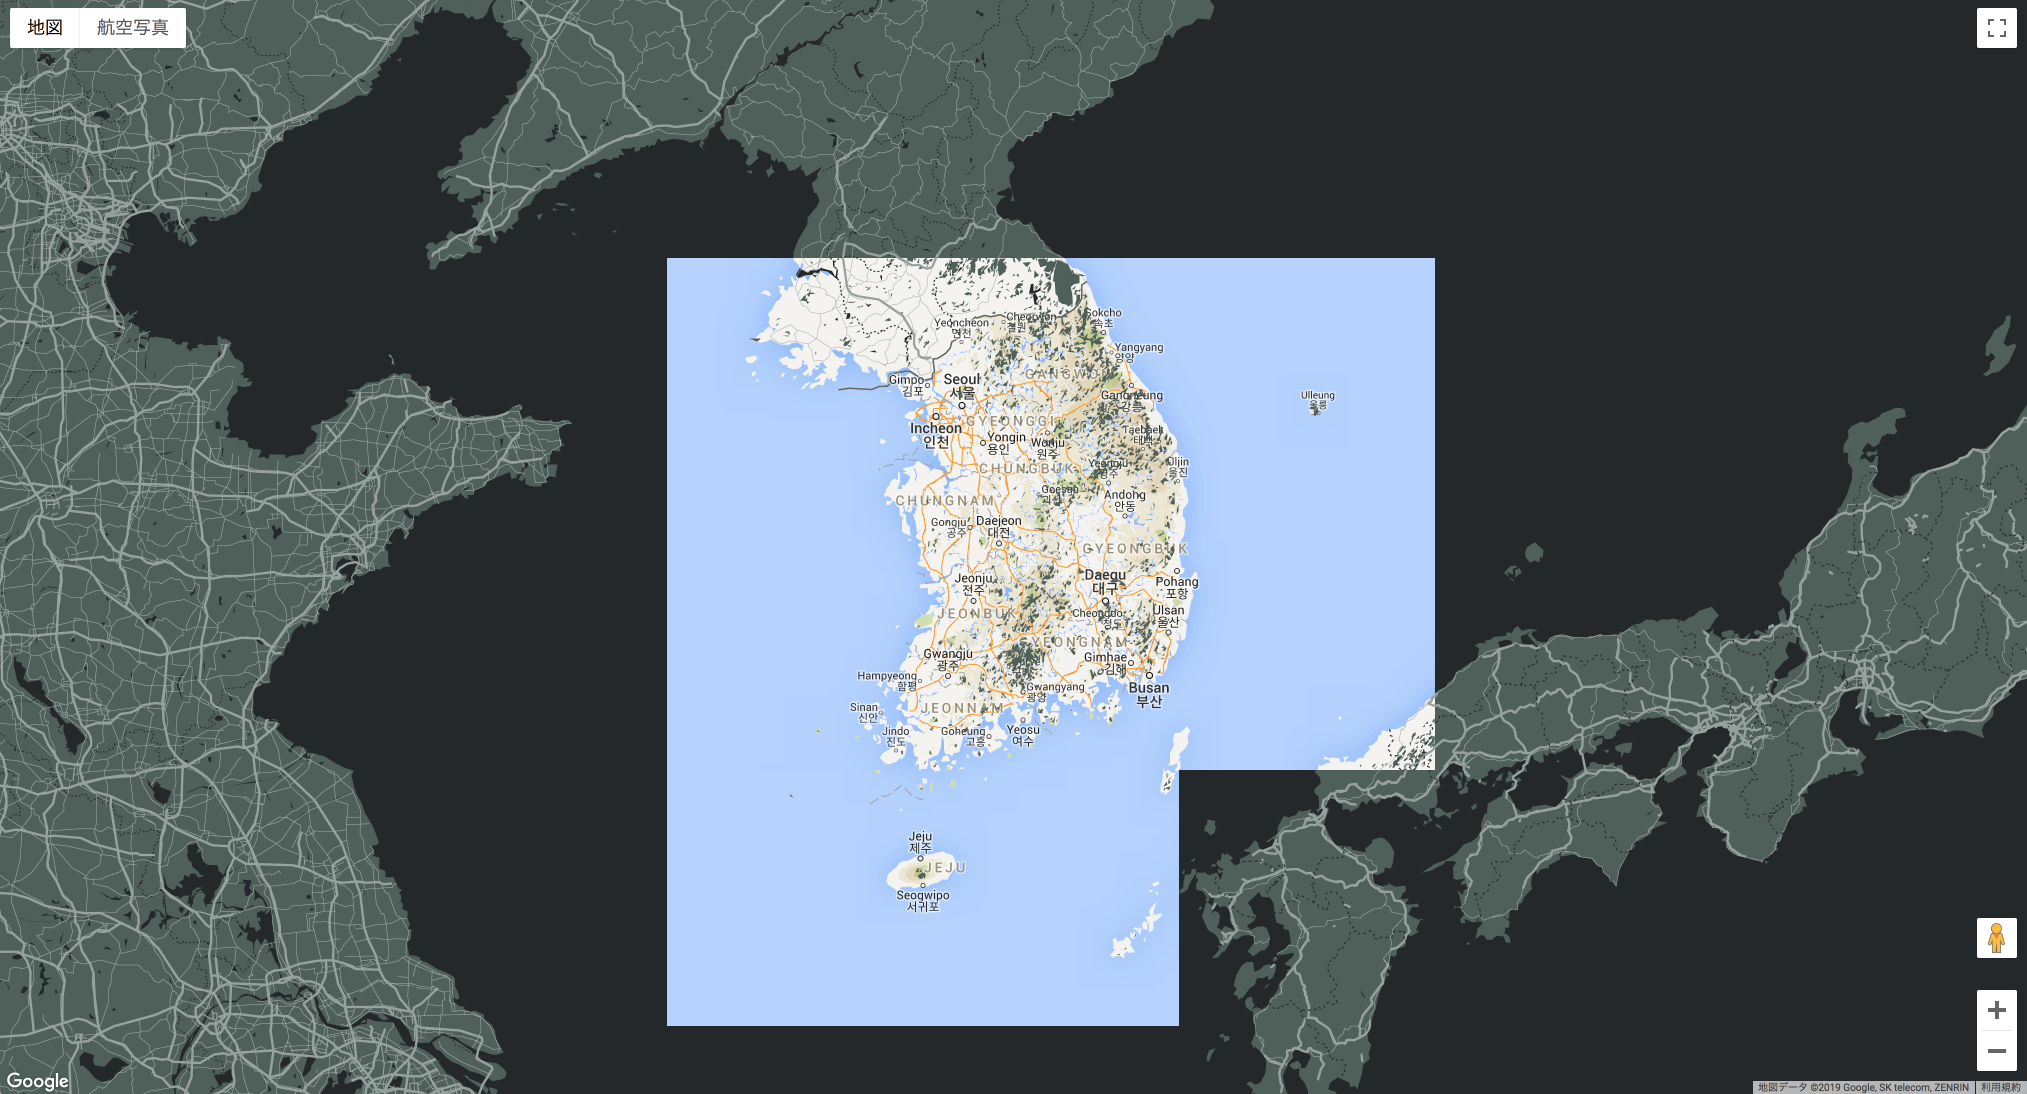 Custom style of Google Map does not apply to Korea